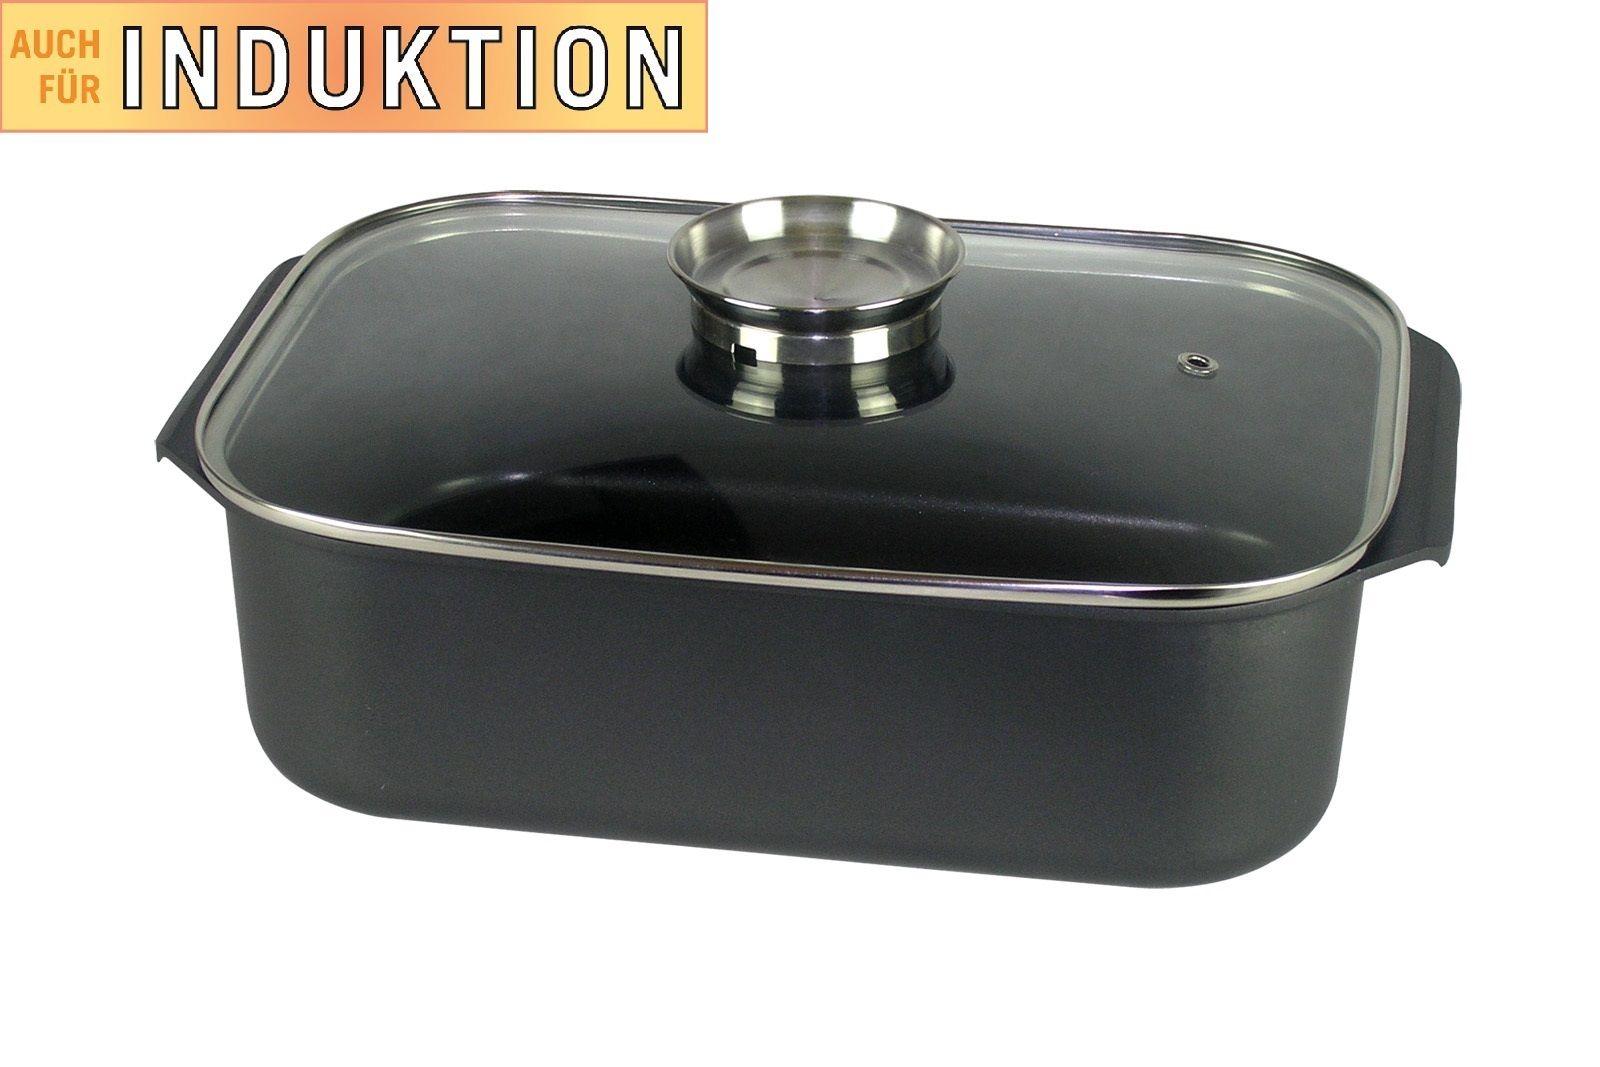 xxl alu br ter 7 8 liter mit deckel induktions schmortopf. Black Bedroom Furniture Sets. Home Design Ideas